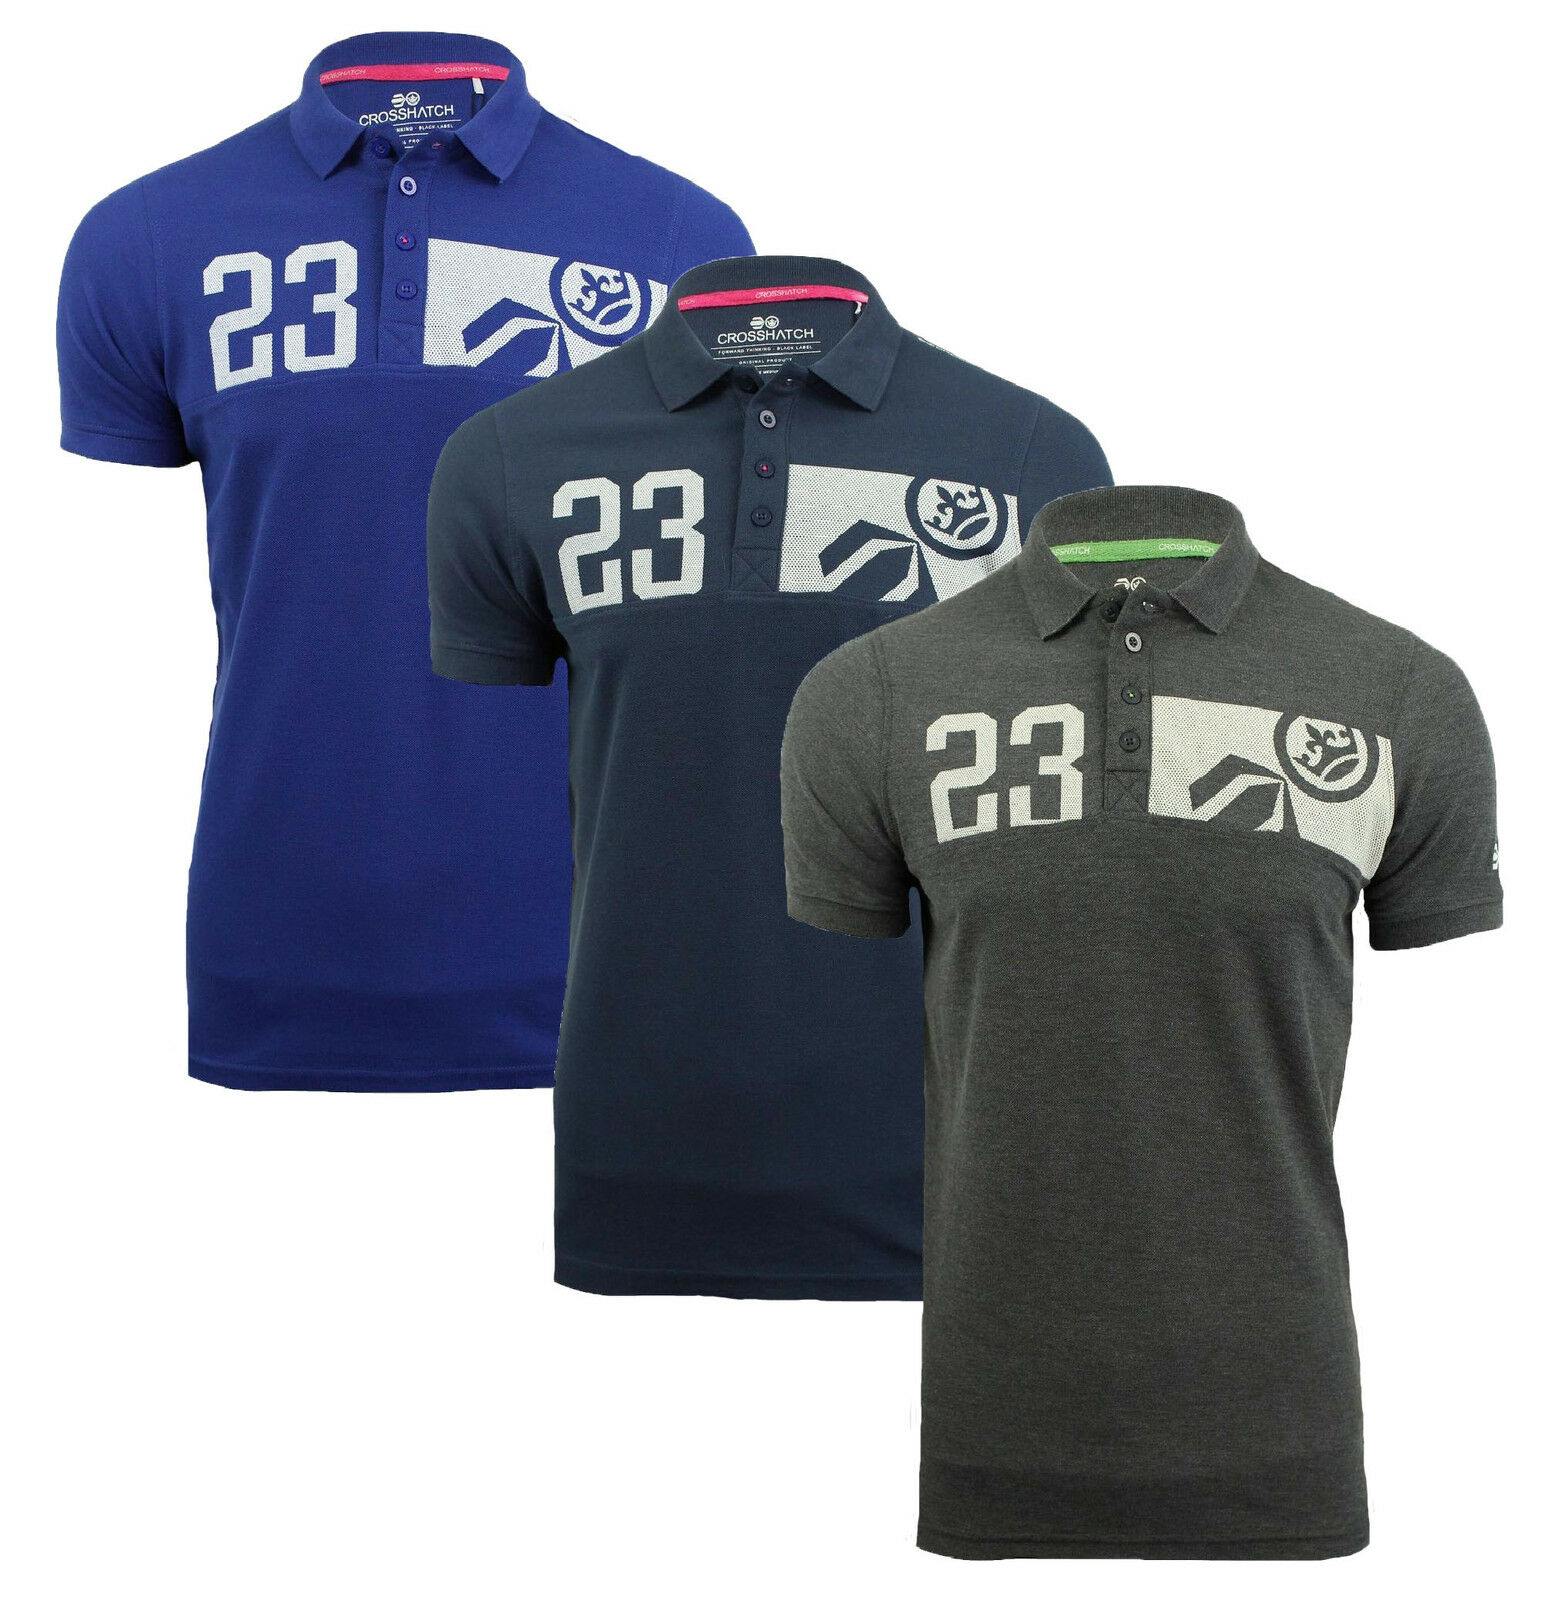 Crosshatch Cotton Polo shirt T-shirt 23 Print Top New Grey Navy bluee Matrix-Two